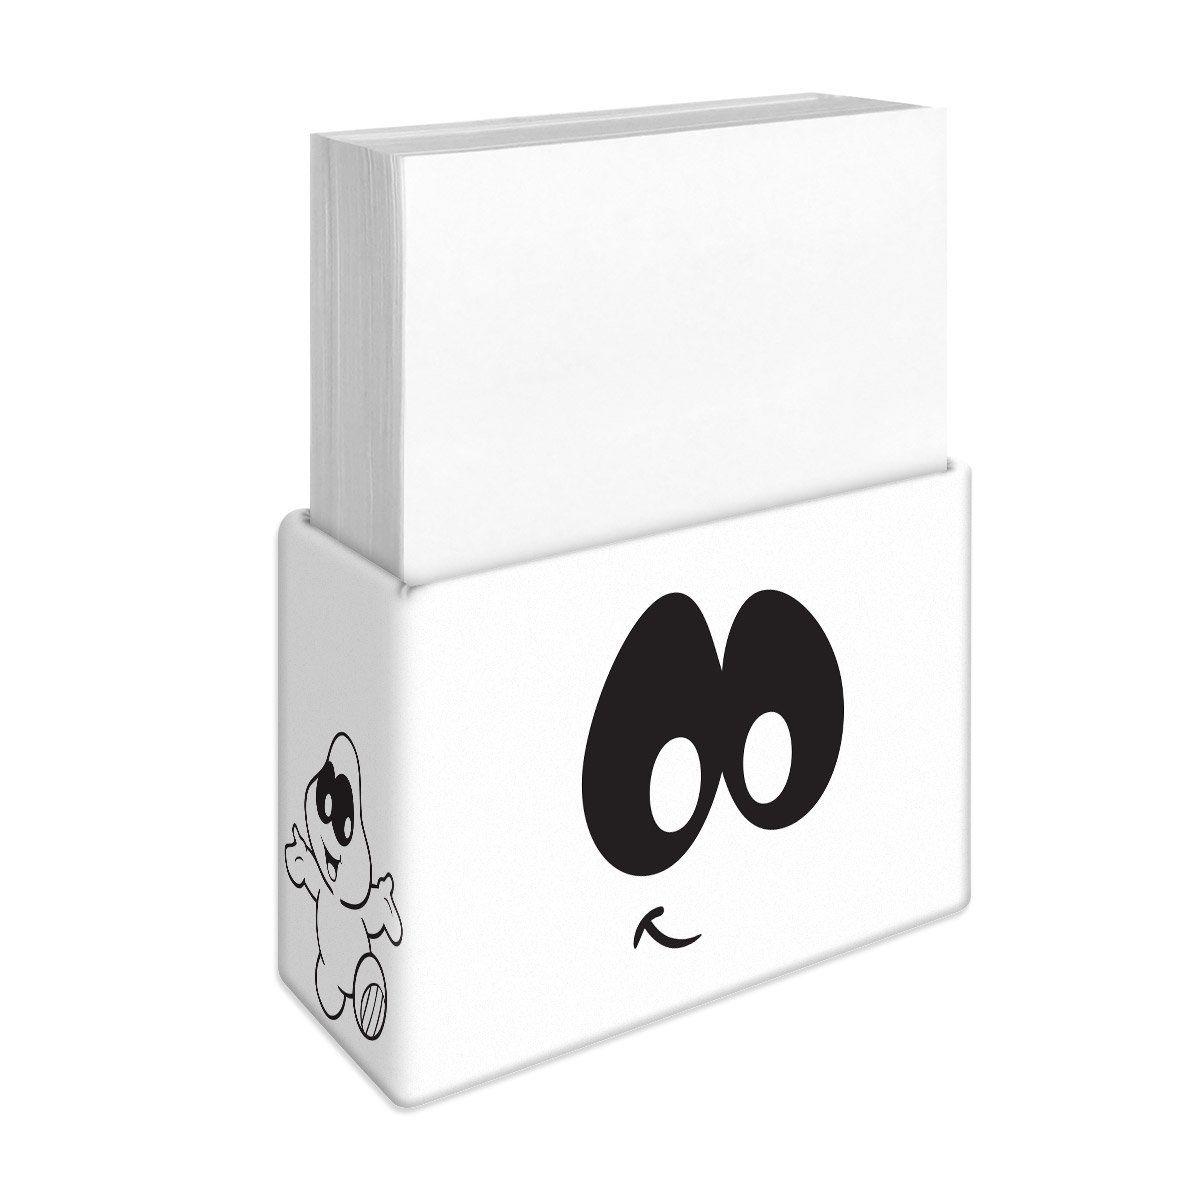 Mini Porta Papel Turma da Mônica - Olhões Penadinho